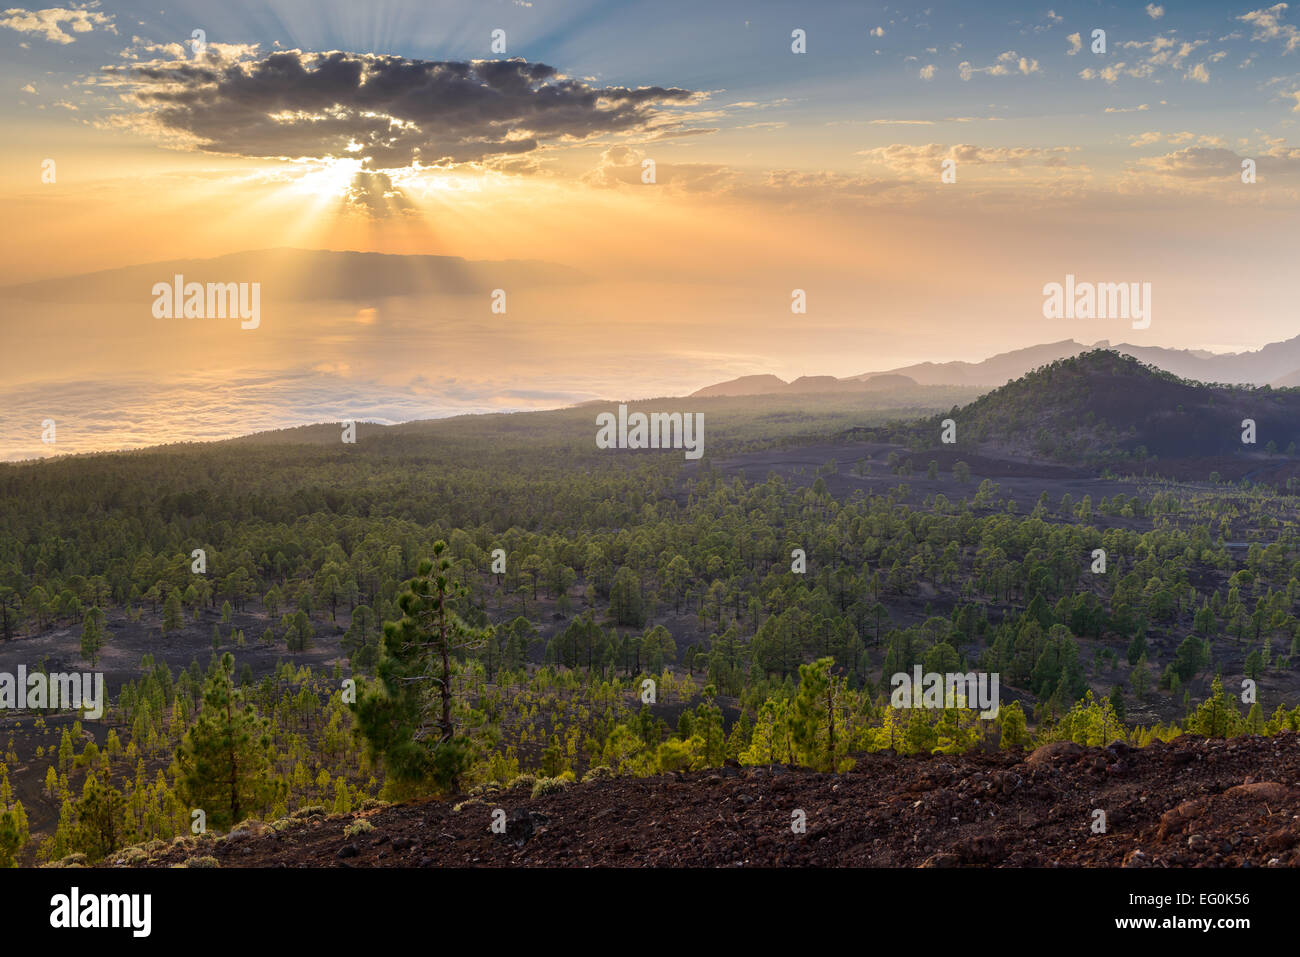 Spanien, Kanarische Inseln, Teneriffa, faszinierenden Vulkanlandschaft Stockbild